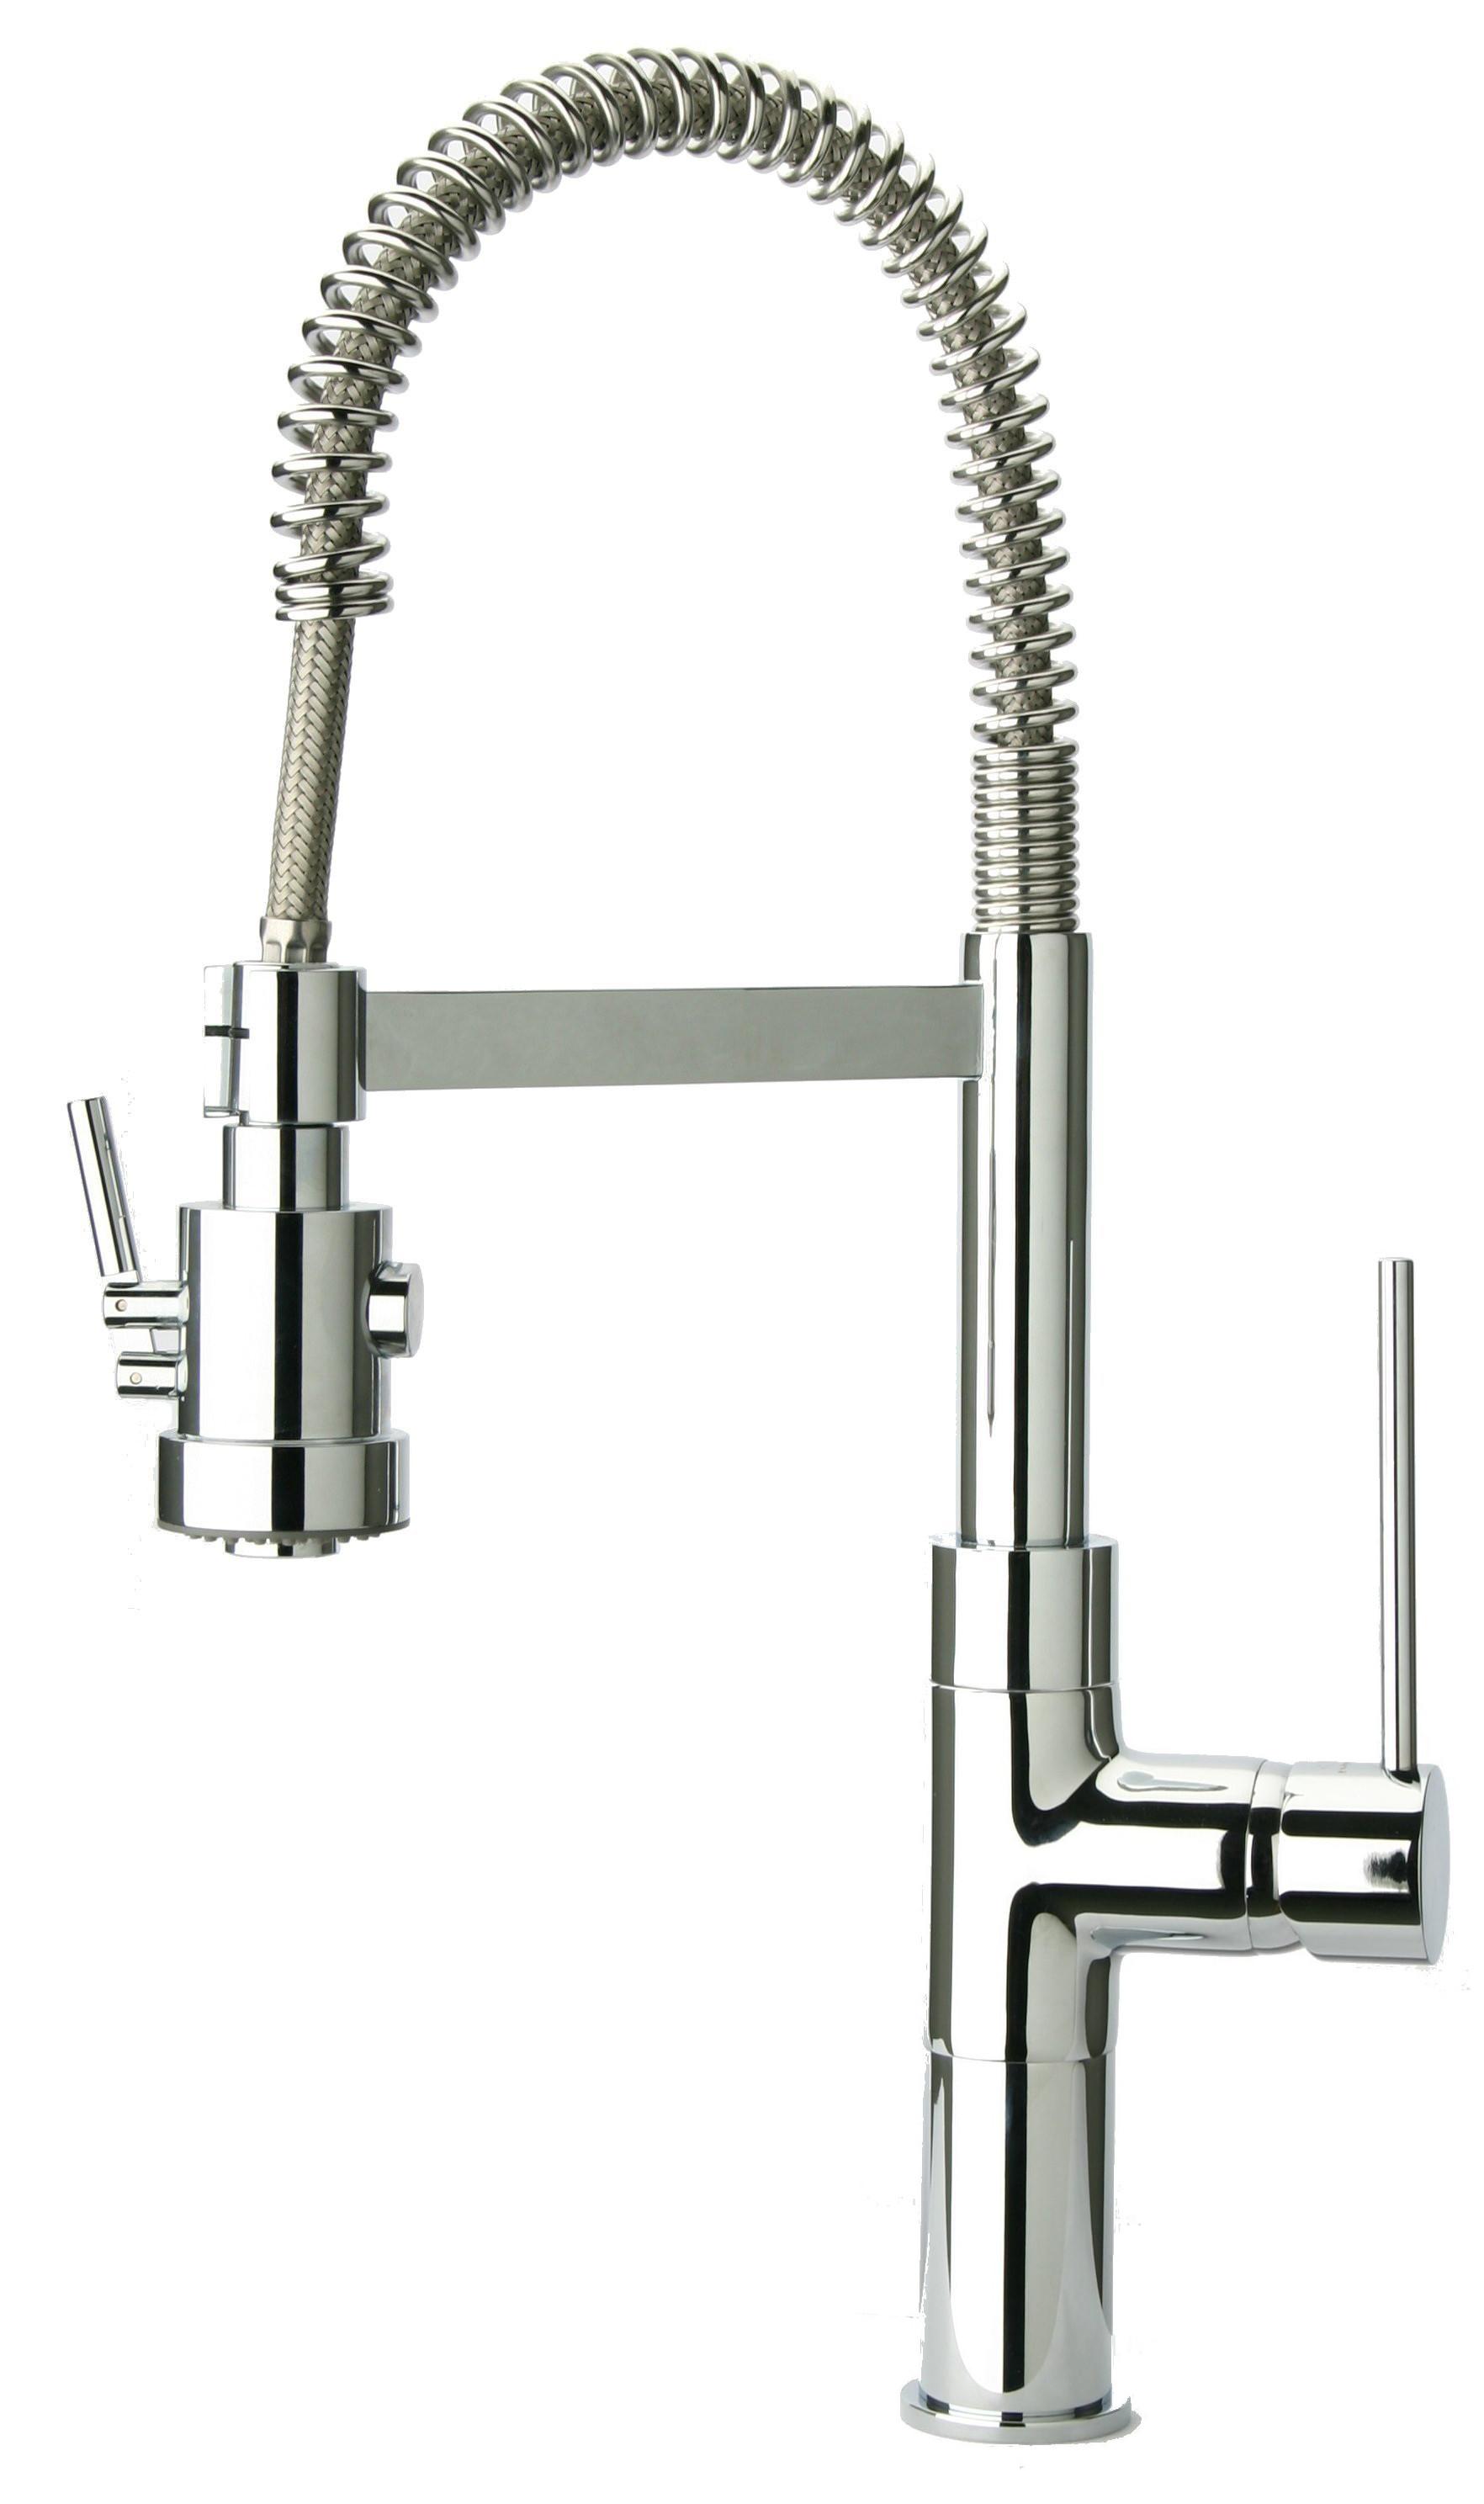 Latoscana 78CR557PHD Elba Single Handle Pull-Out Spray Kitchen Faucet - Chrome